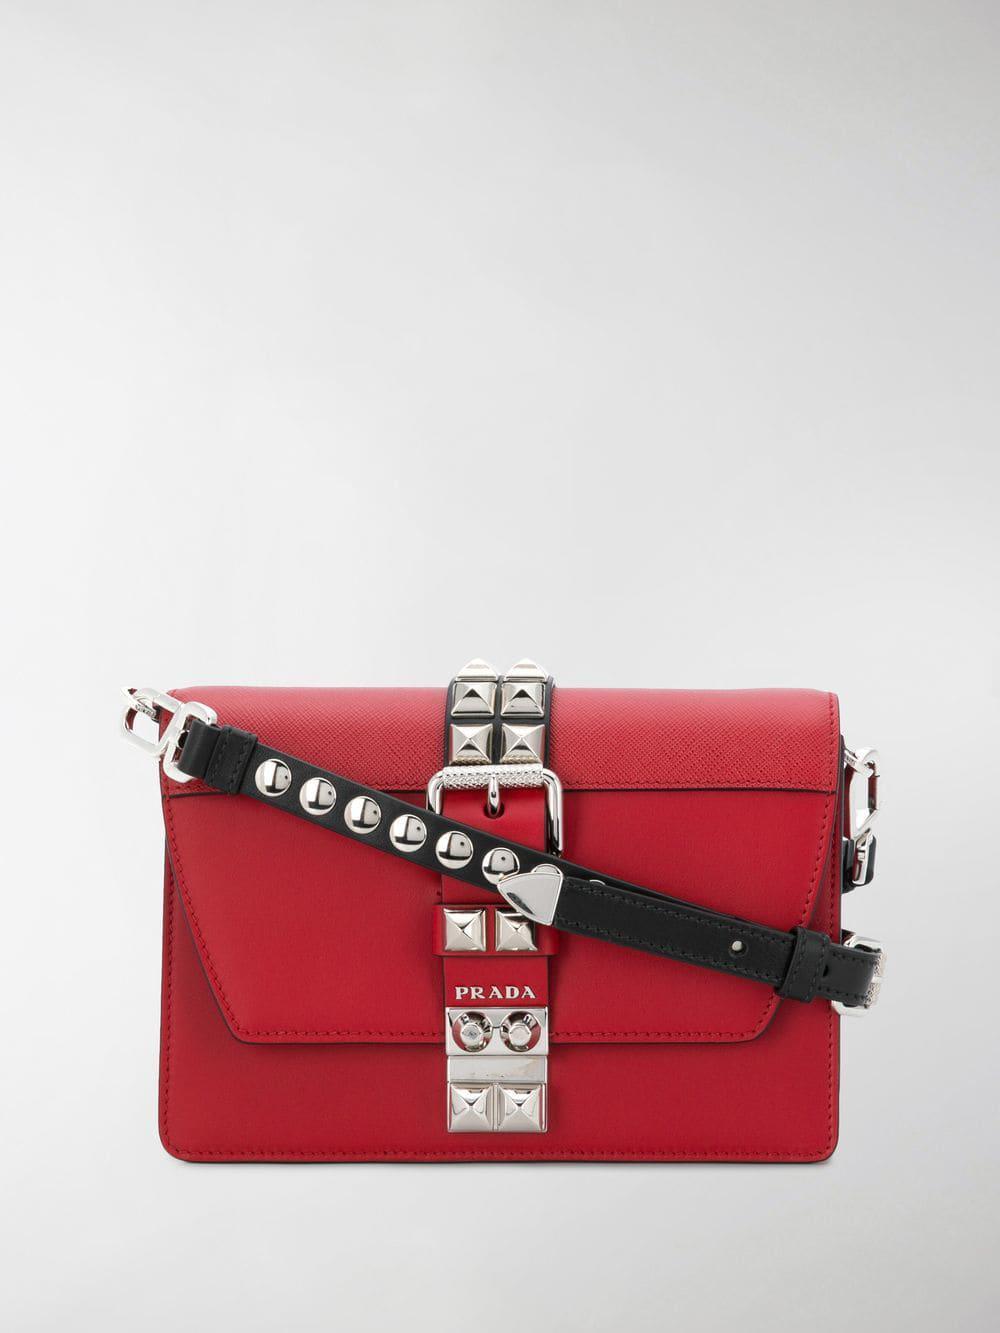 ffec0c709e95 Prada - Women's Red Elektra Small Leather Shoulder Bag - Lyst. View  fullscreen